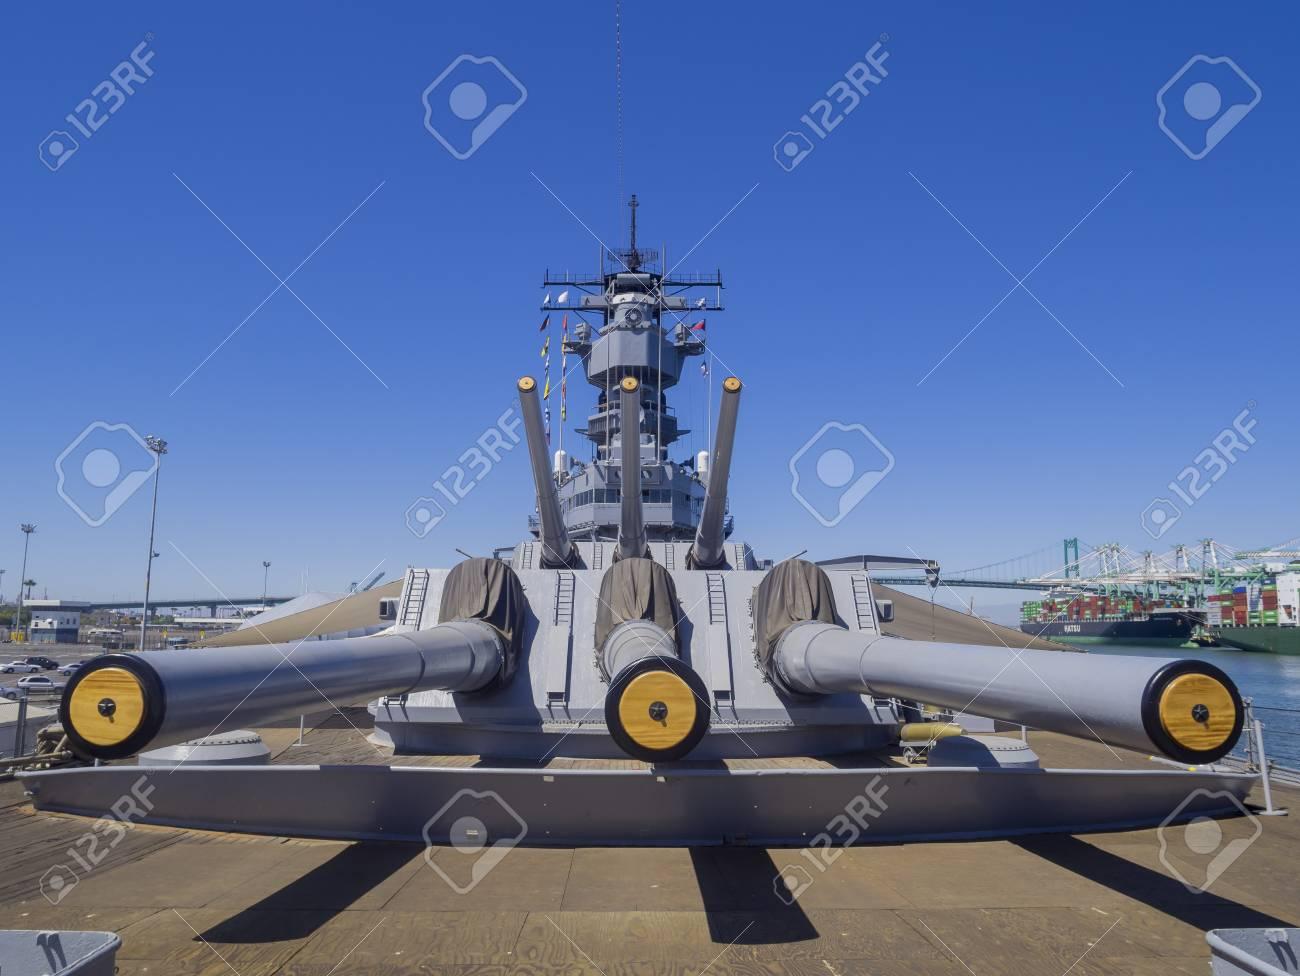 Long Beach, JUL 24: Battleship USS Iowa on JUL 24, 2014 at Long